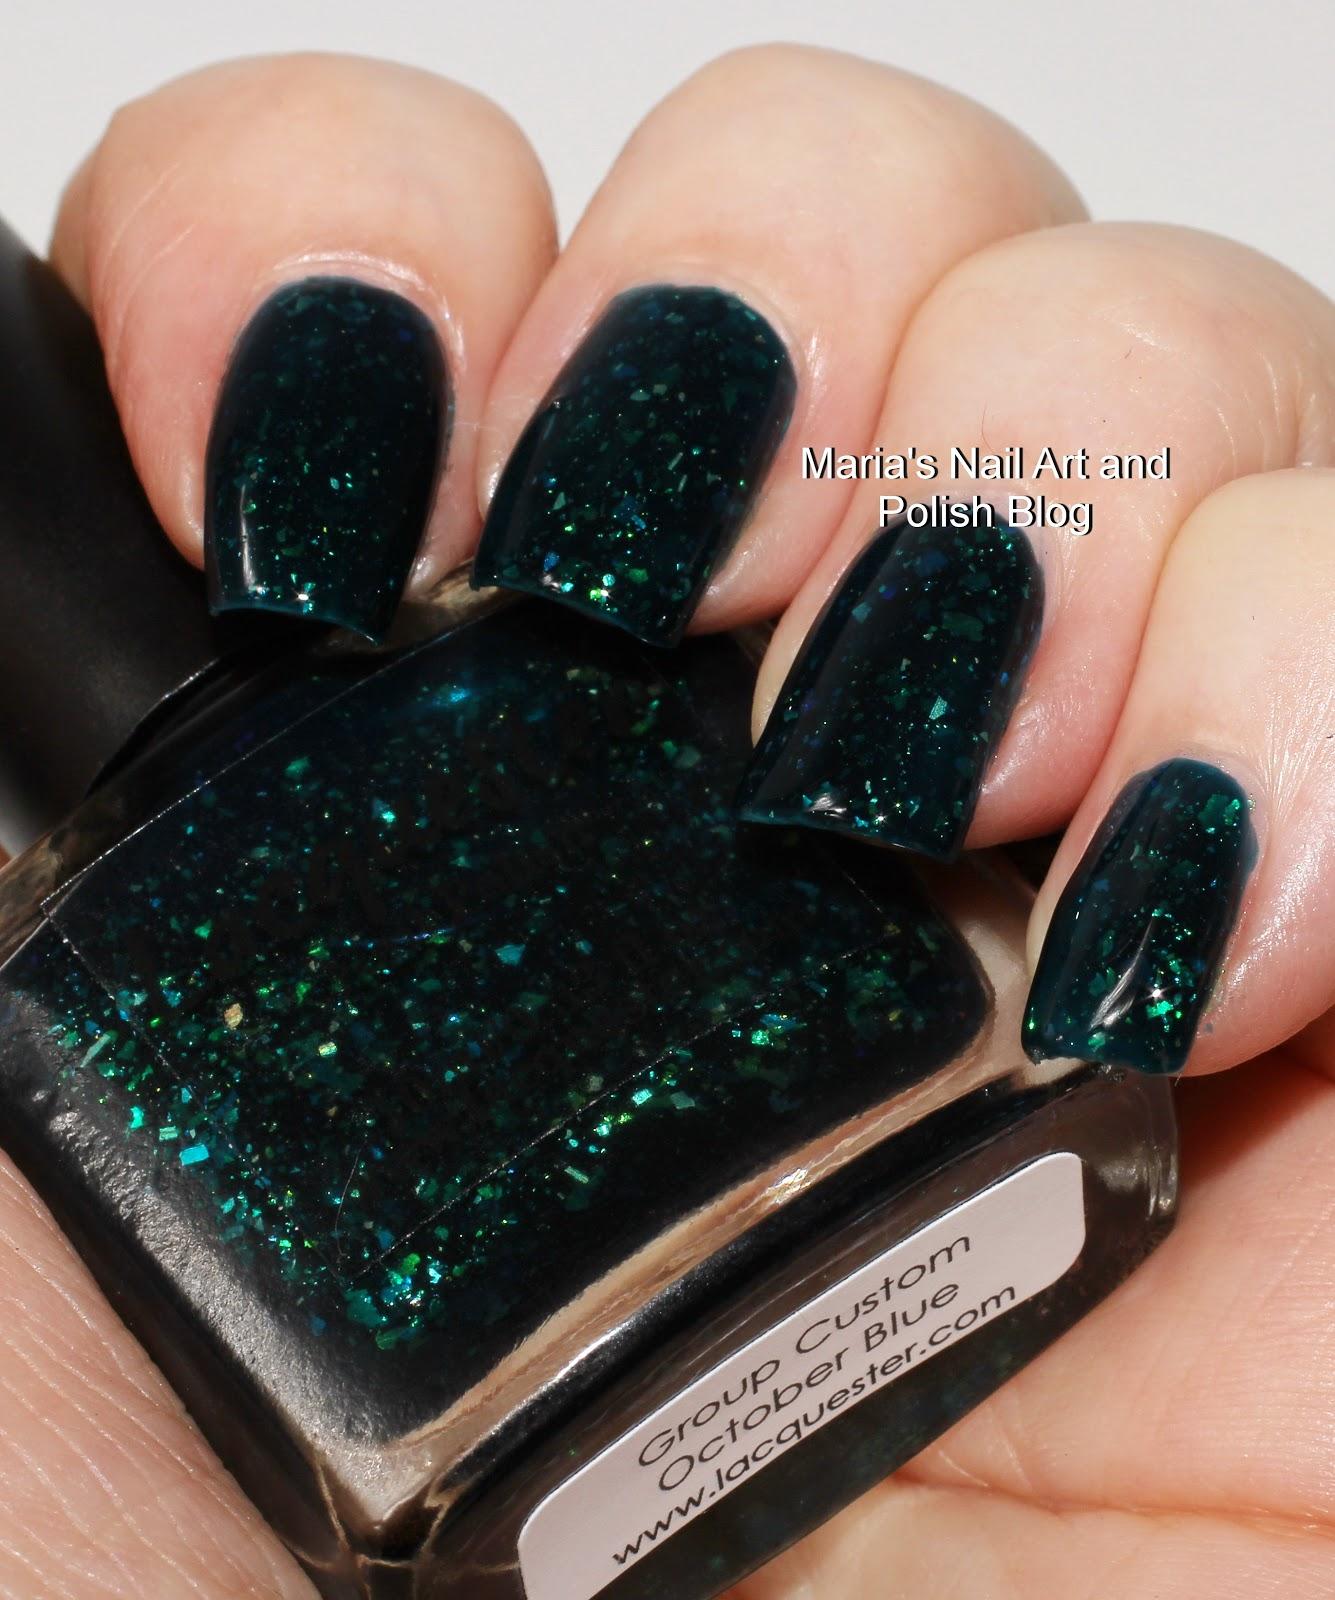 Marias Nail Art and Polish Blog: Lacquester October Blue and October ...